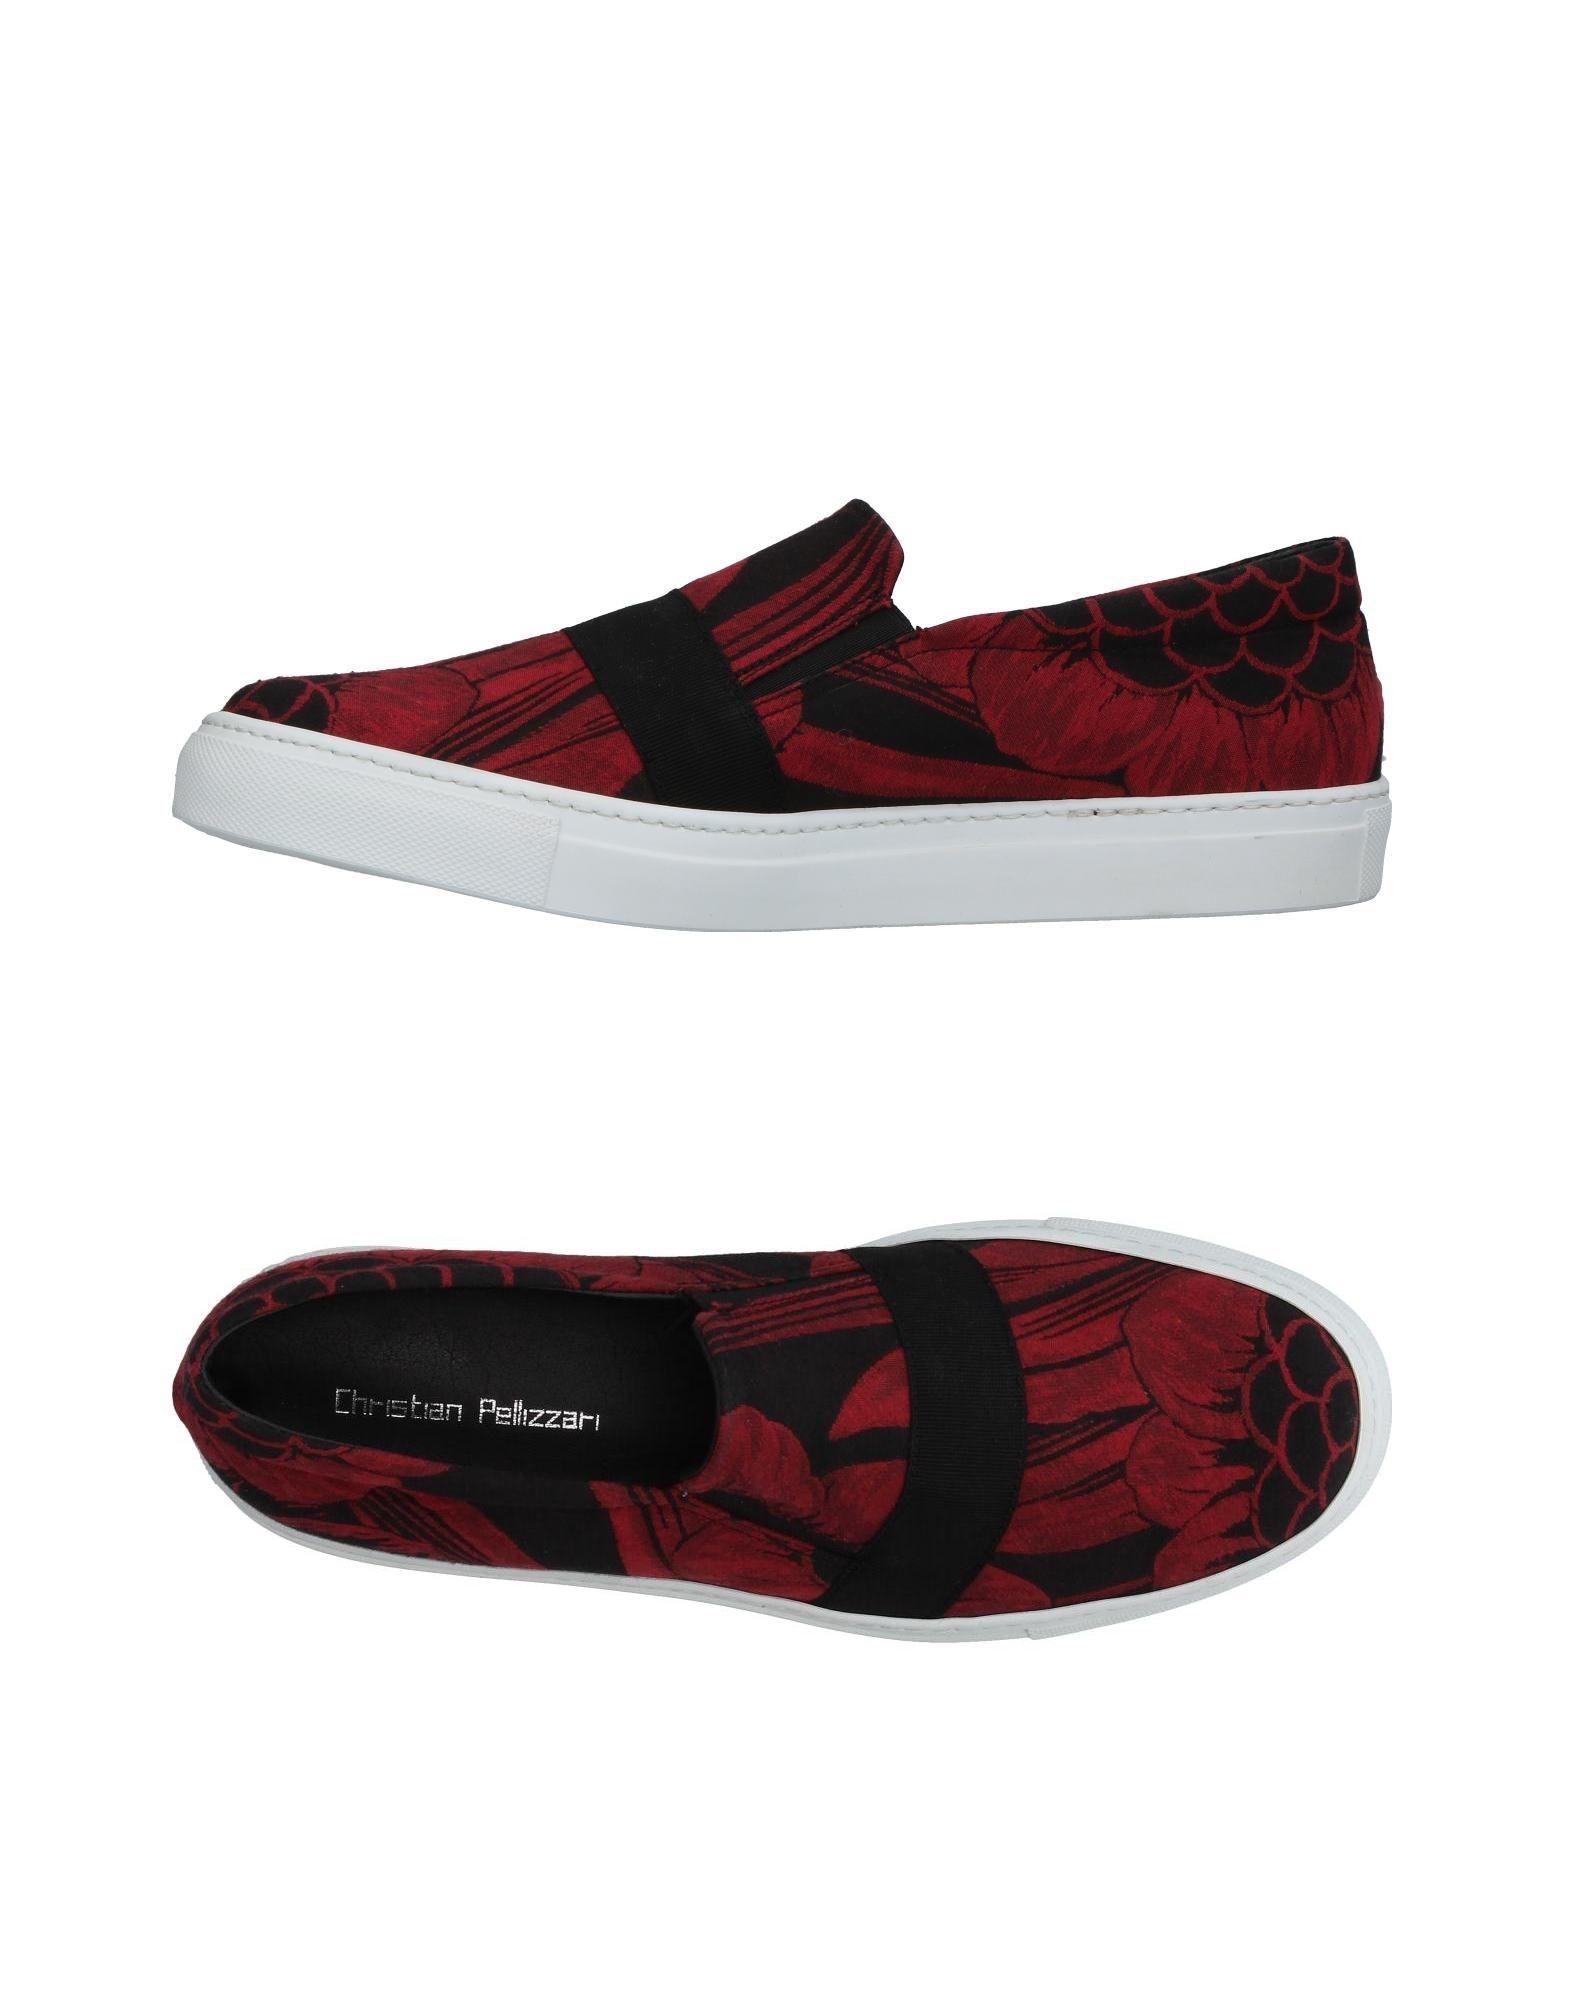 FOOTWEAR - Low-tops & sneakers Christian Pellizzari nt7gbZwX